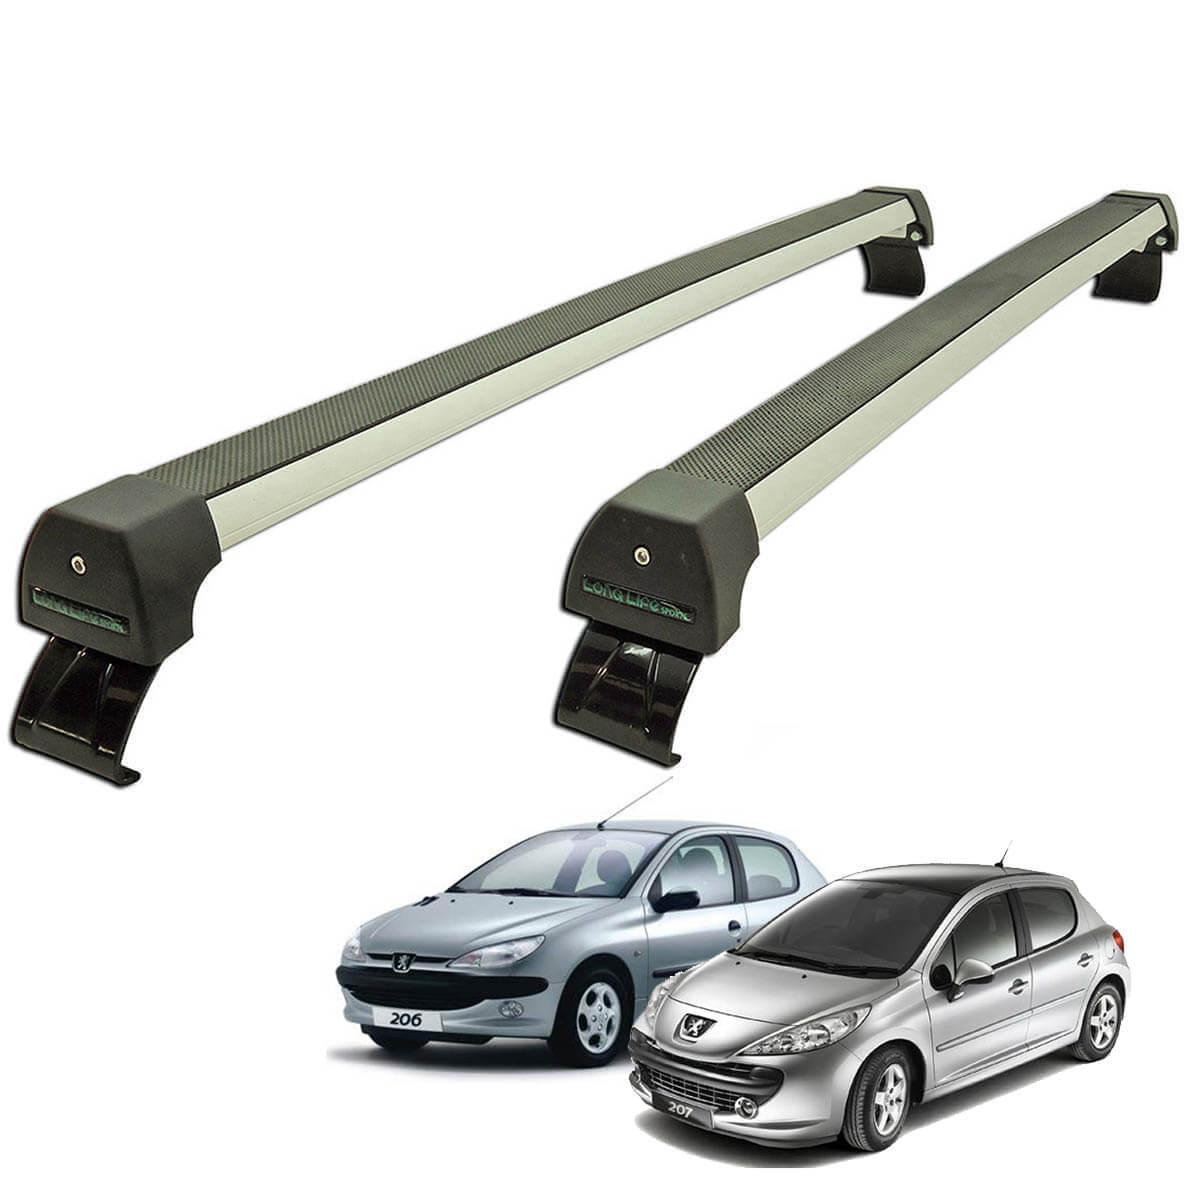 Rack de teto Long Life Sports Peugeot 206 1999 a 2009 e Peugeot 207 2010 a 2015 4 portas